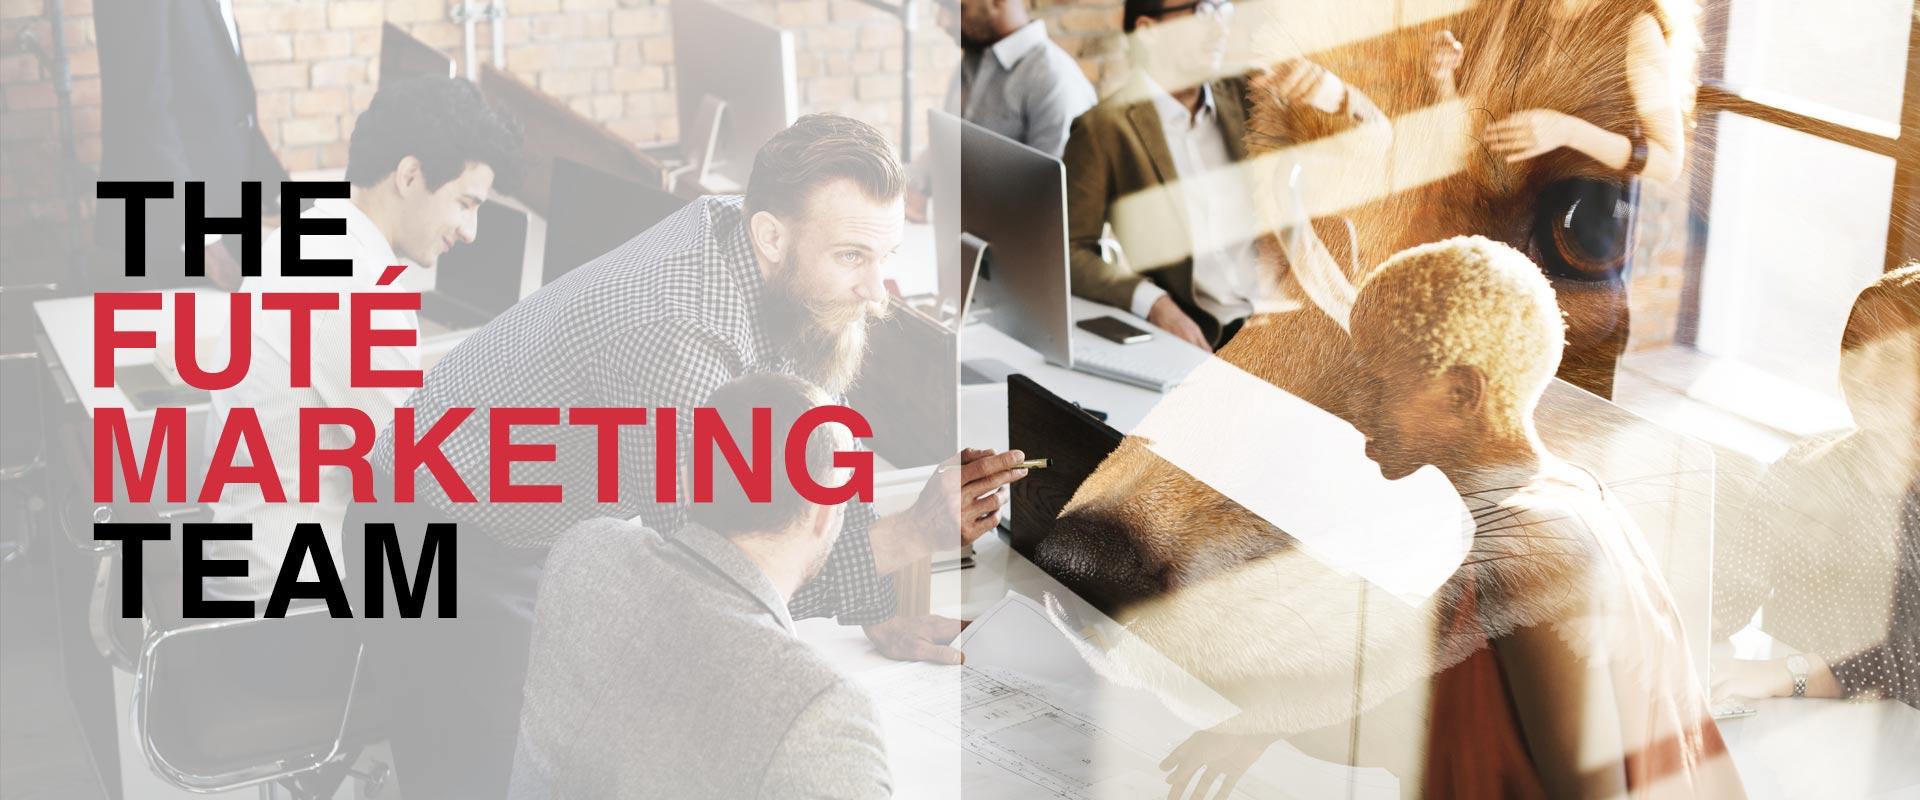 fute marketing web strategy agency team 1920x800 002 - Team - Futé Marketing